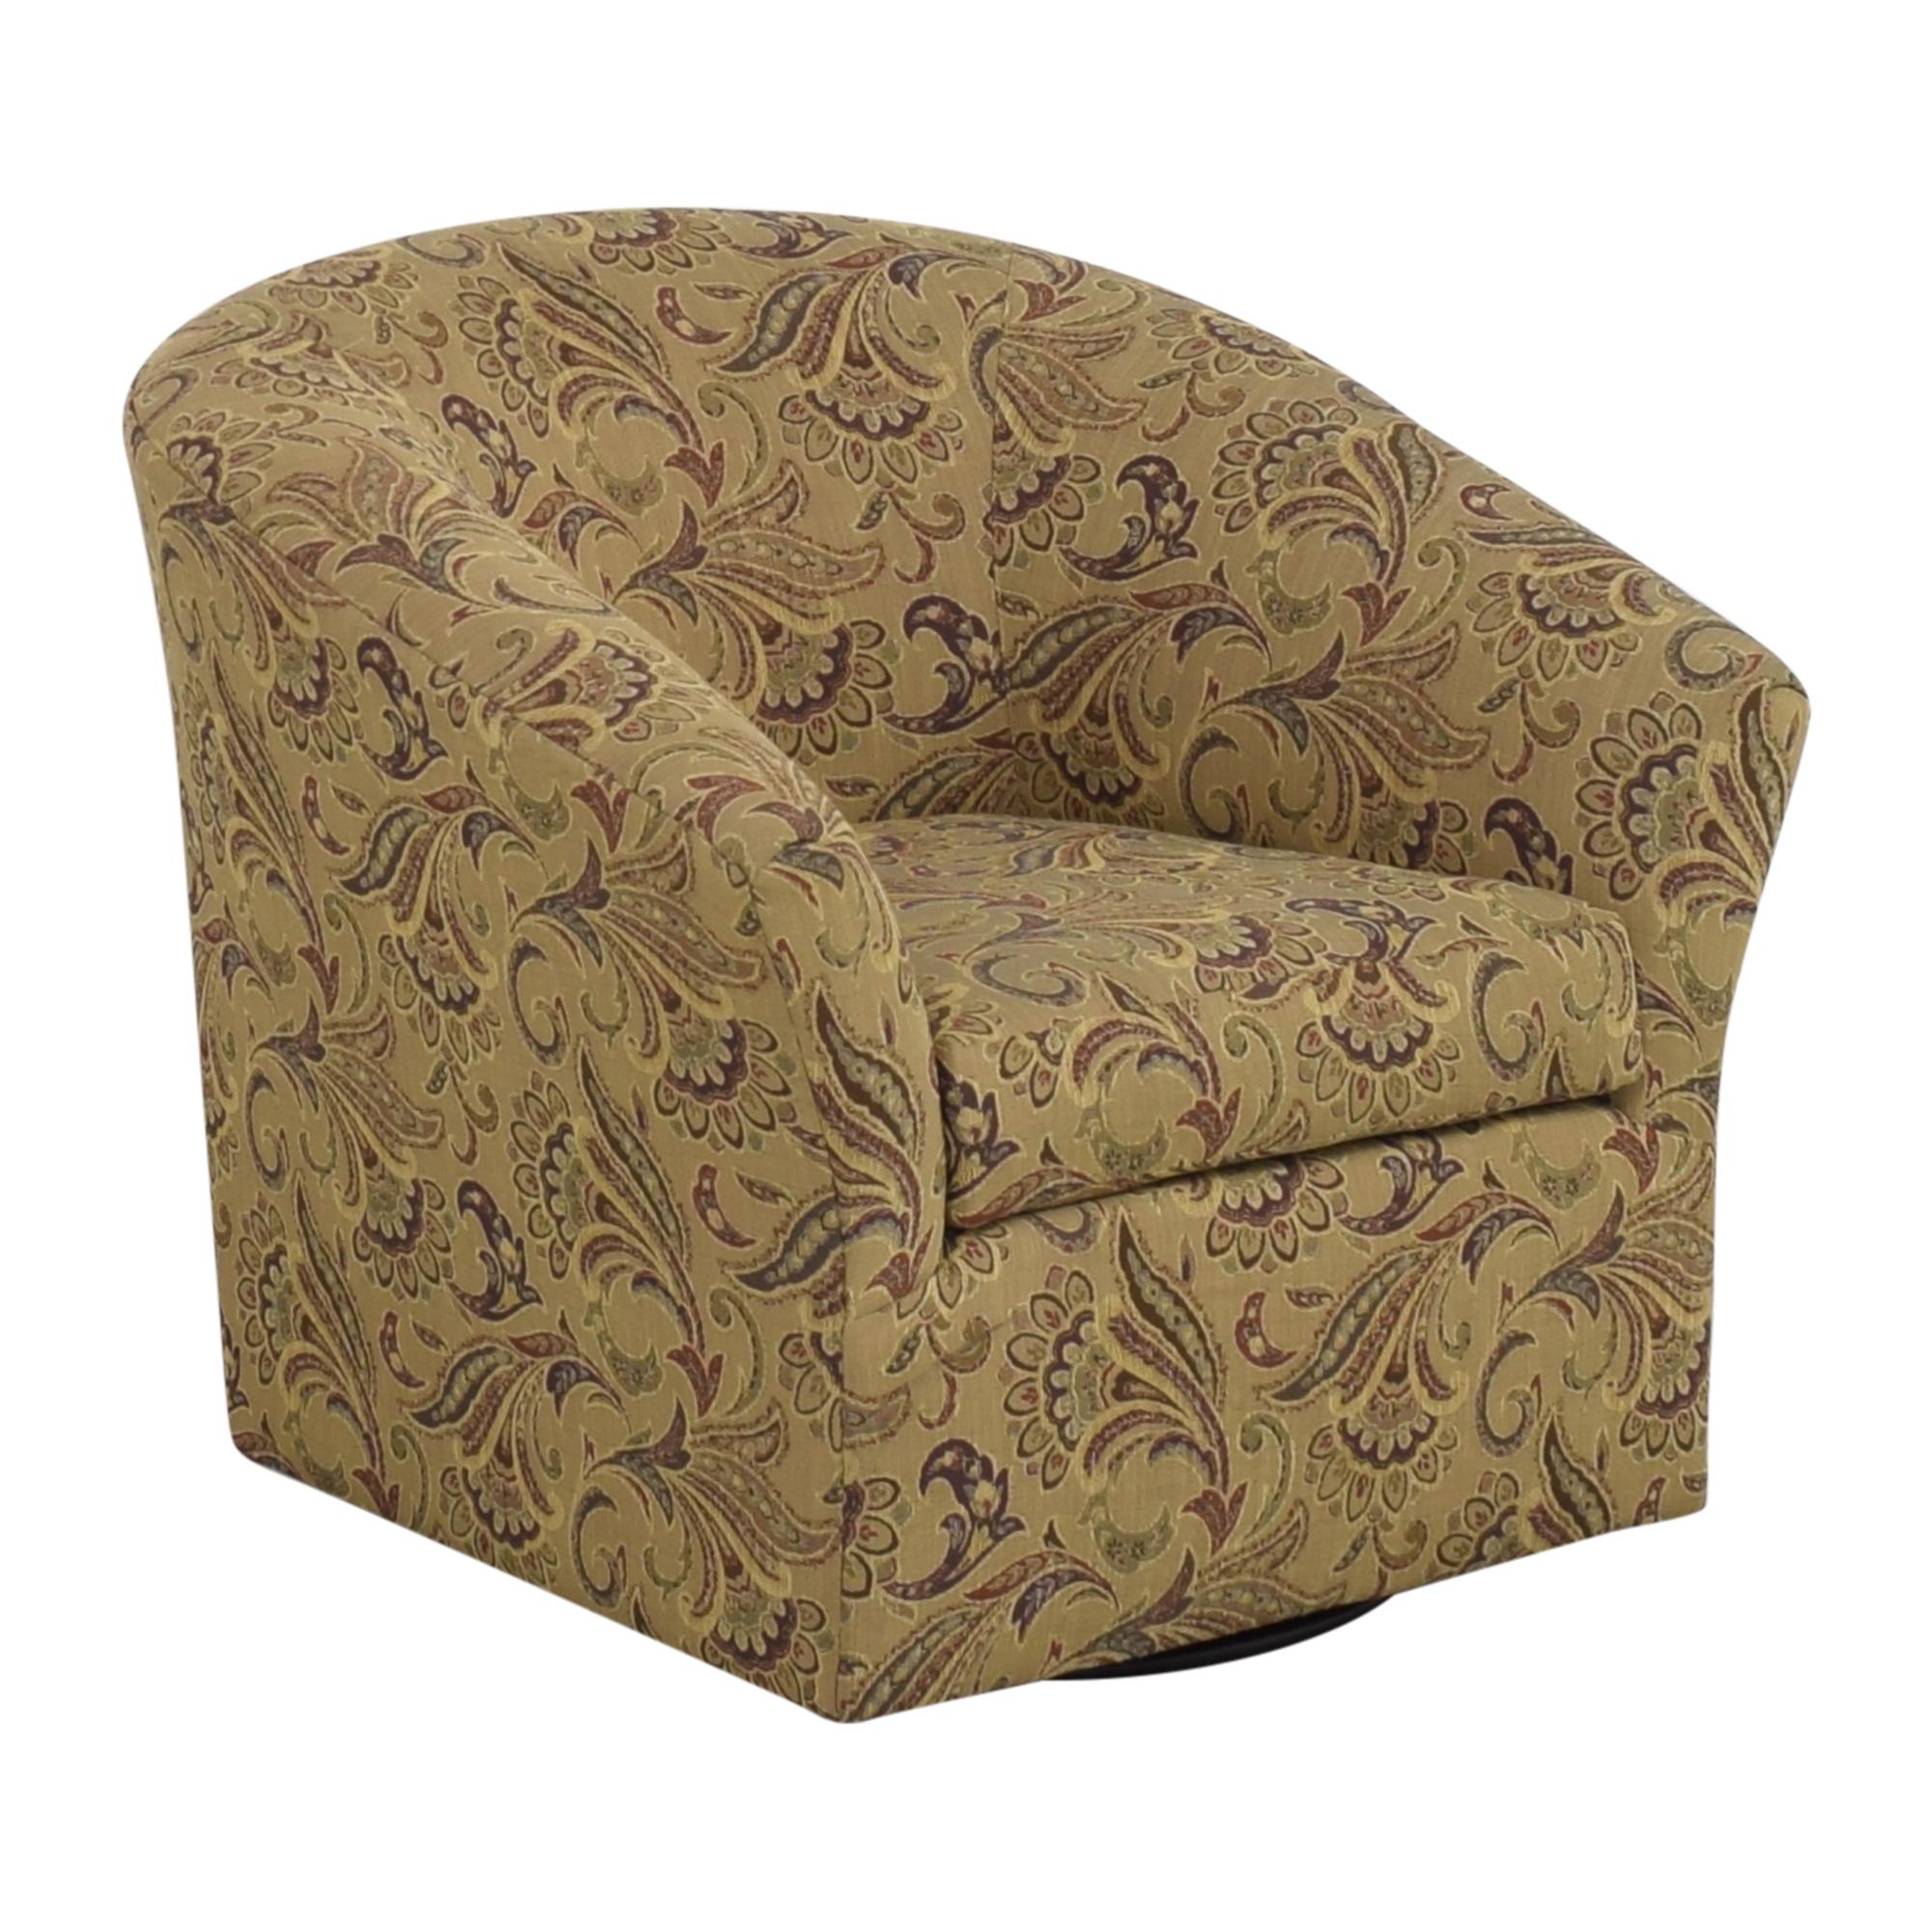 Hooker Furniture Sam Moore Swivel Accent Chair Hooker Furniture